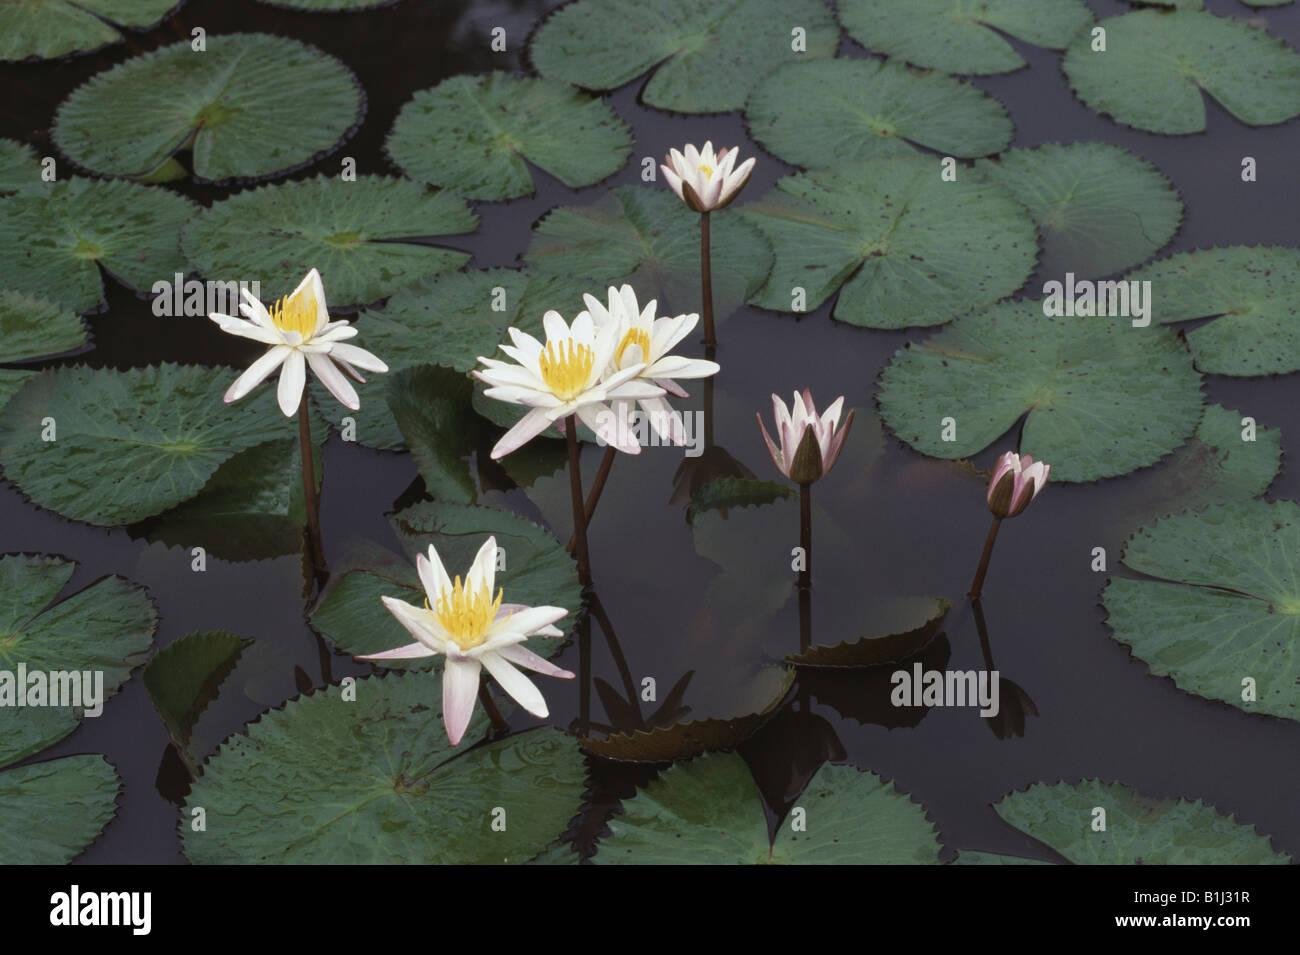 Water lilies in a pond tamil nadu india stock photo 18222563 alamy water lilies in a pond tamil nadu india izmirmasajfo